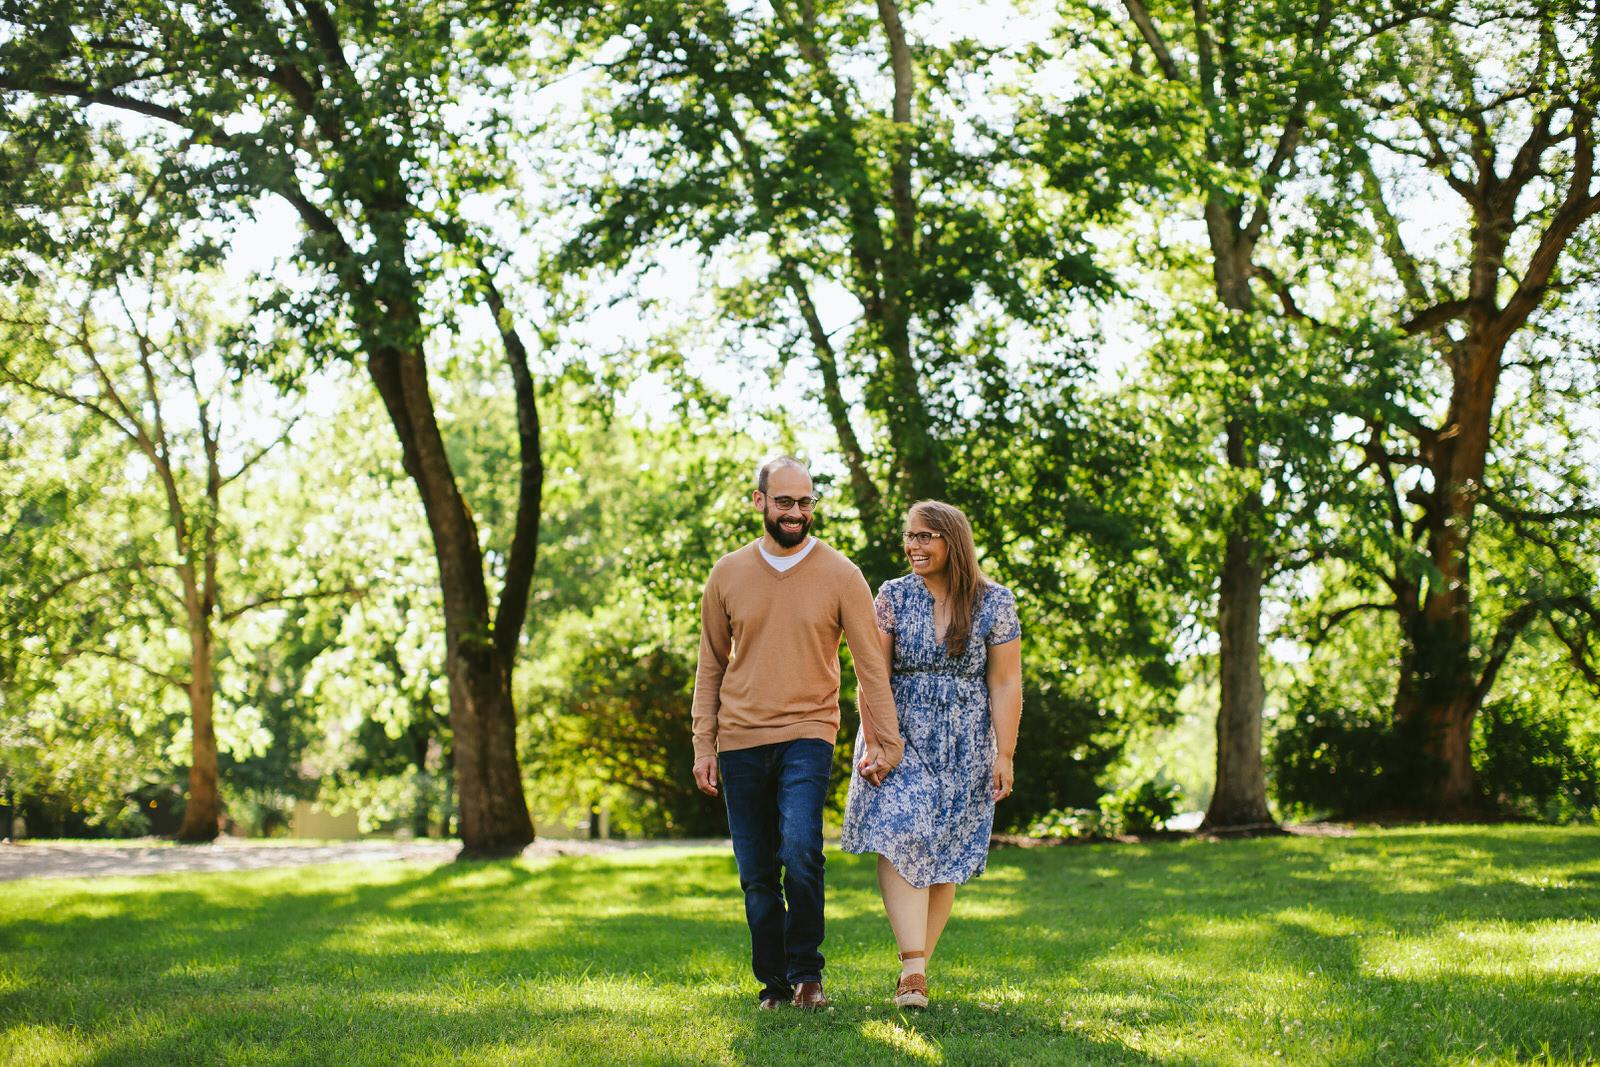 nashville-backyard-proposal-engagement-portraits-tiny-house-photo.jpg